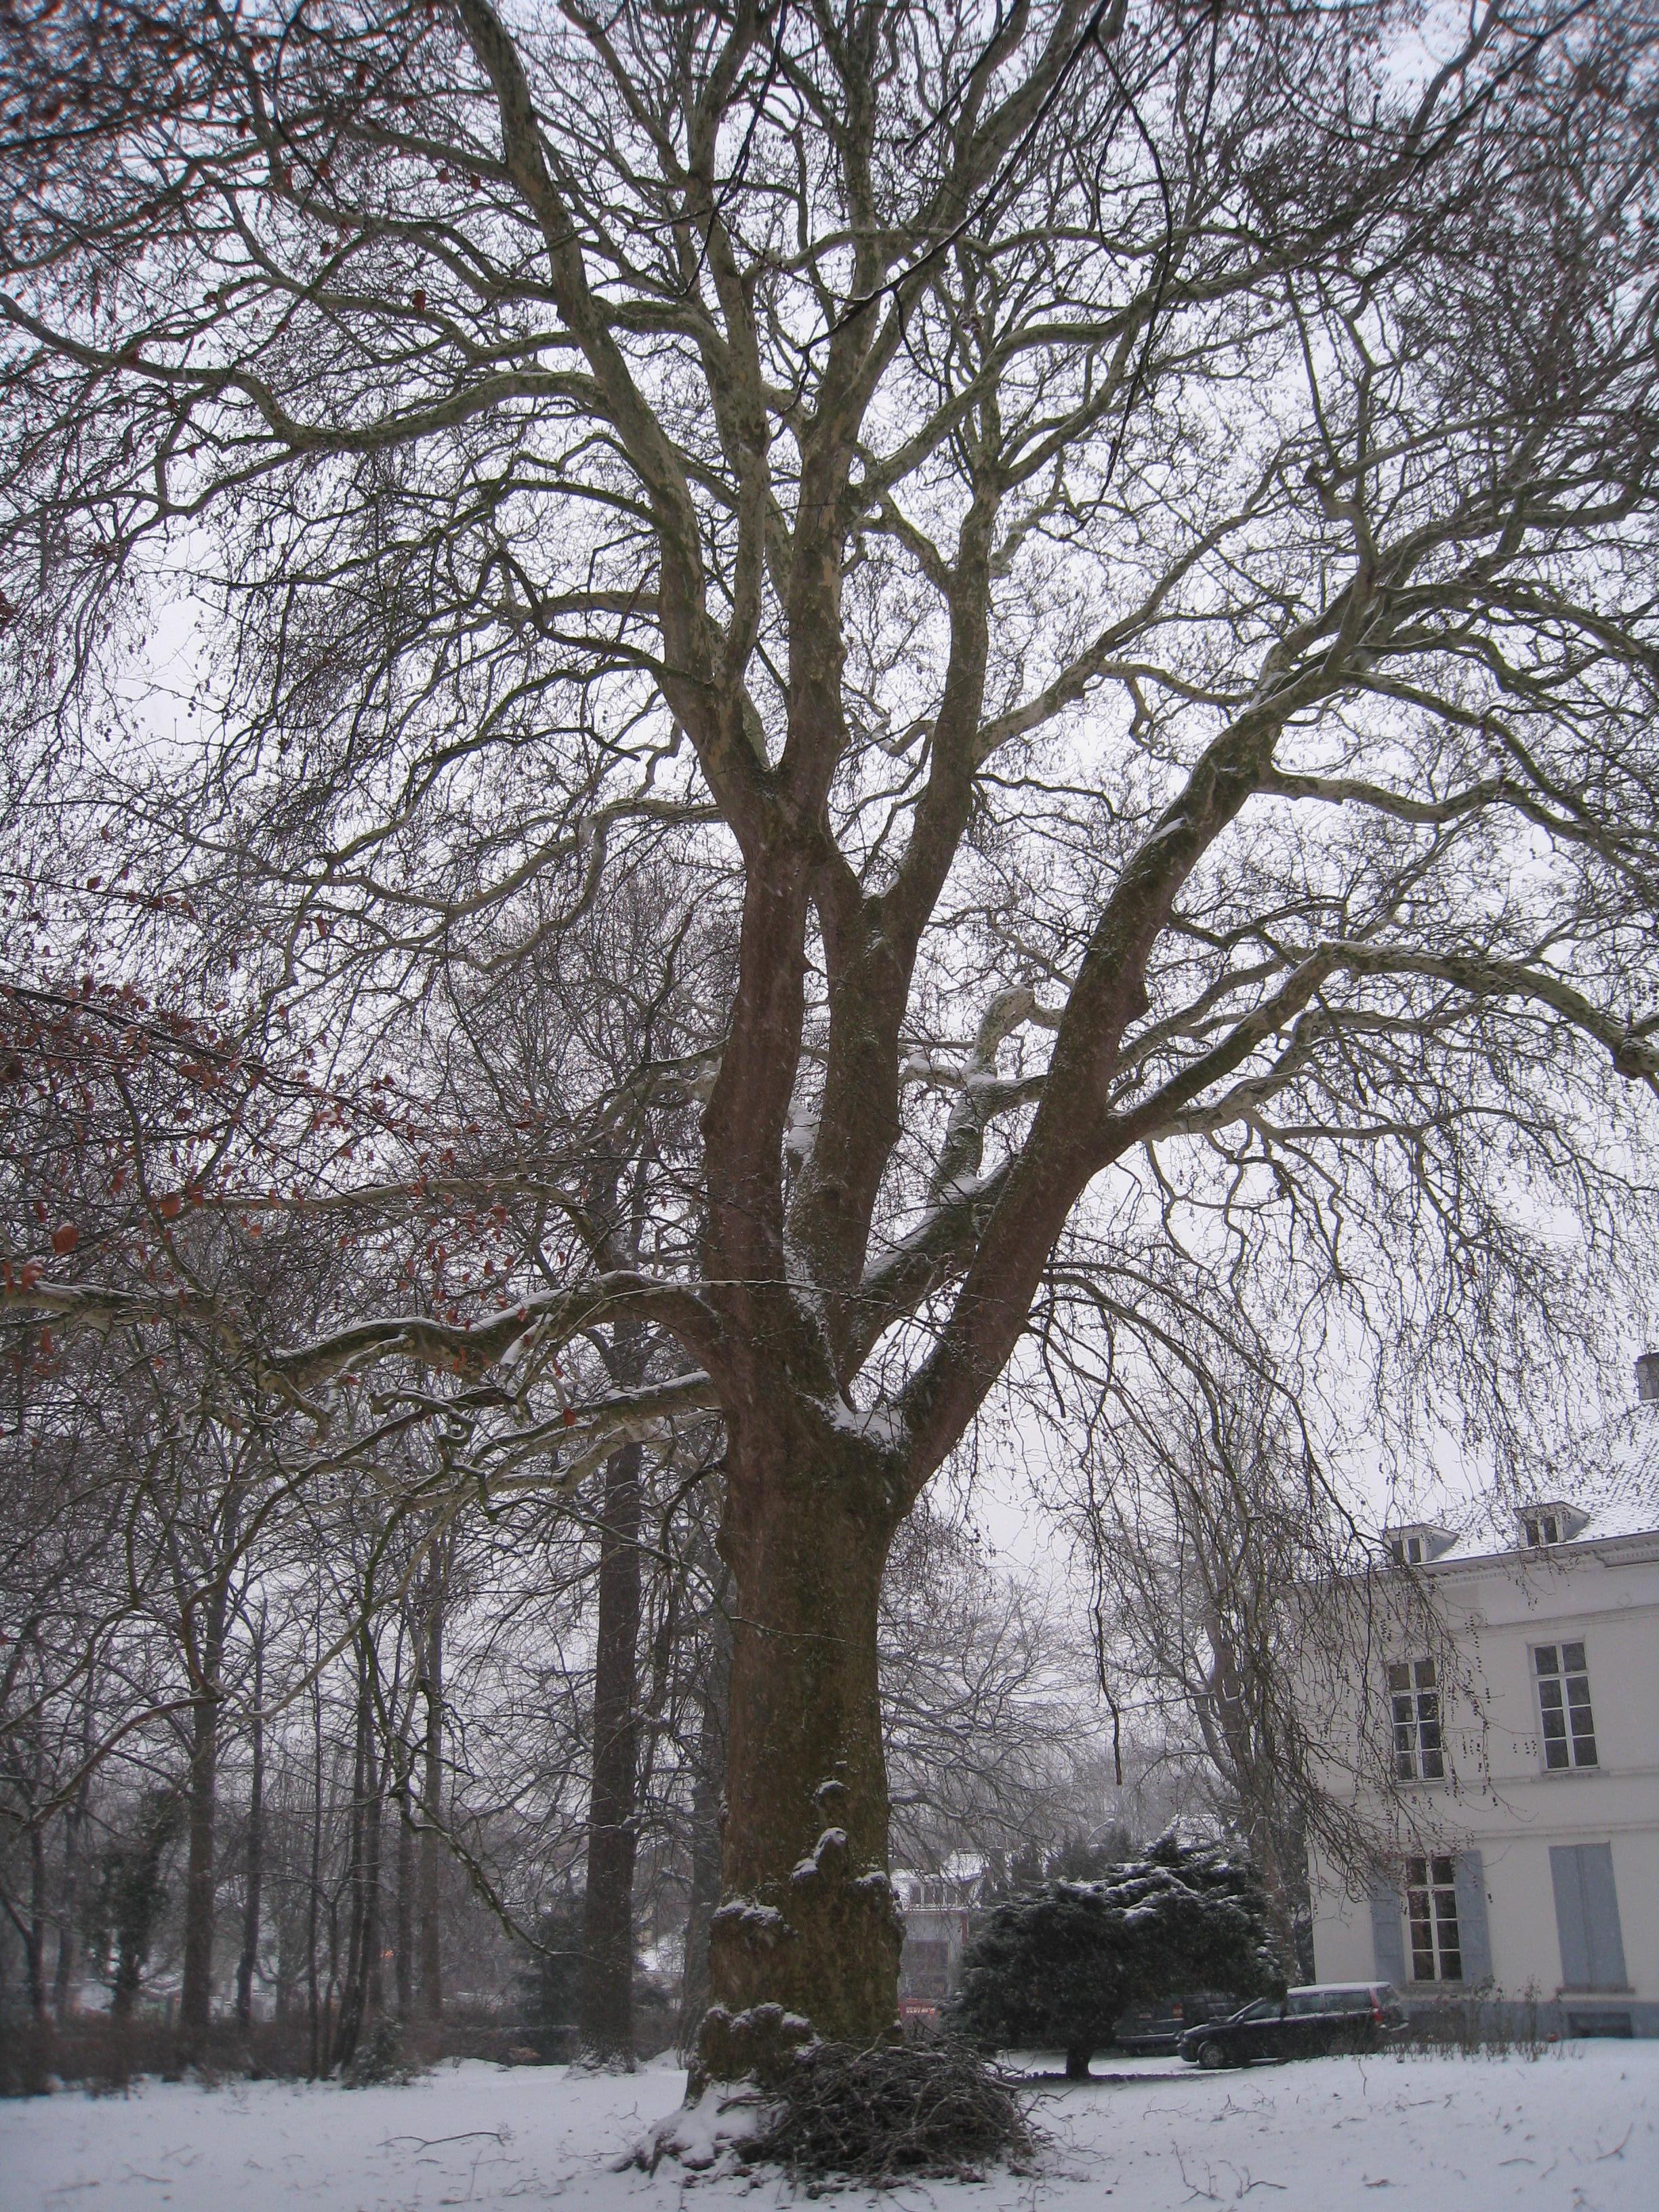 Platane d'Orient – Woluwé-Saint-Lambert, Propriété Voot, Rue Voot, 67 –  13 Janvier 2010